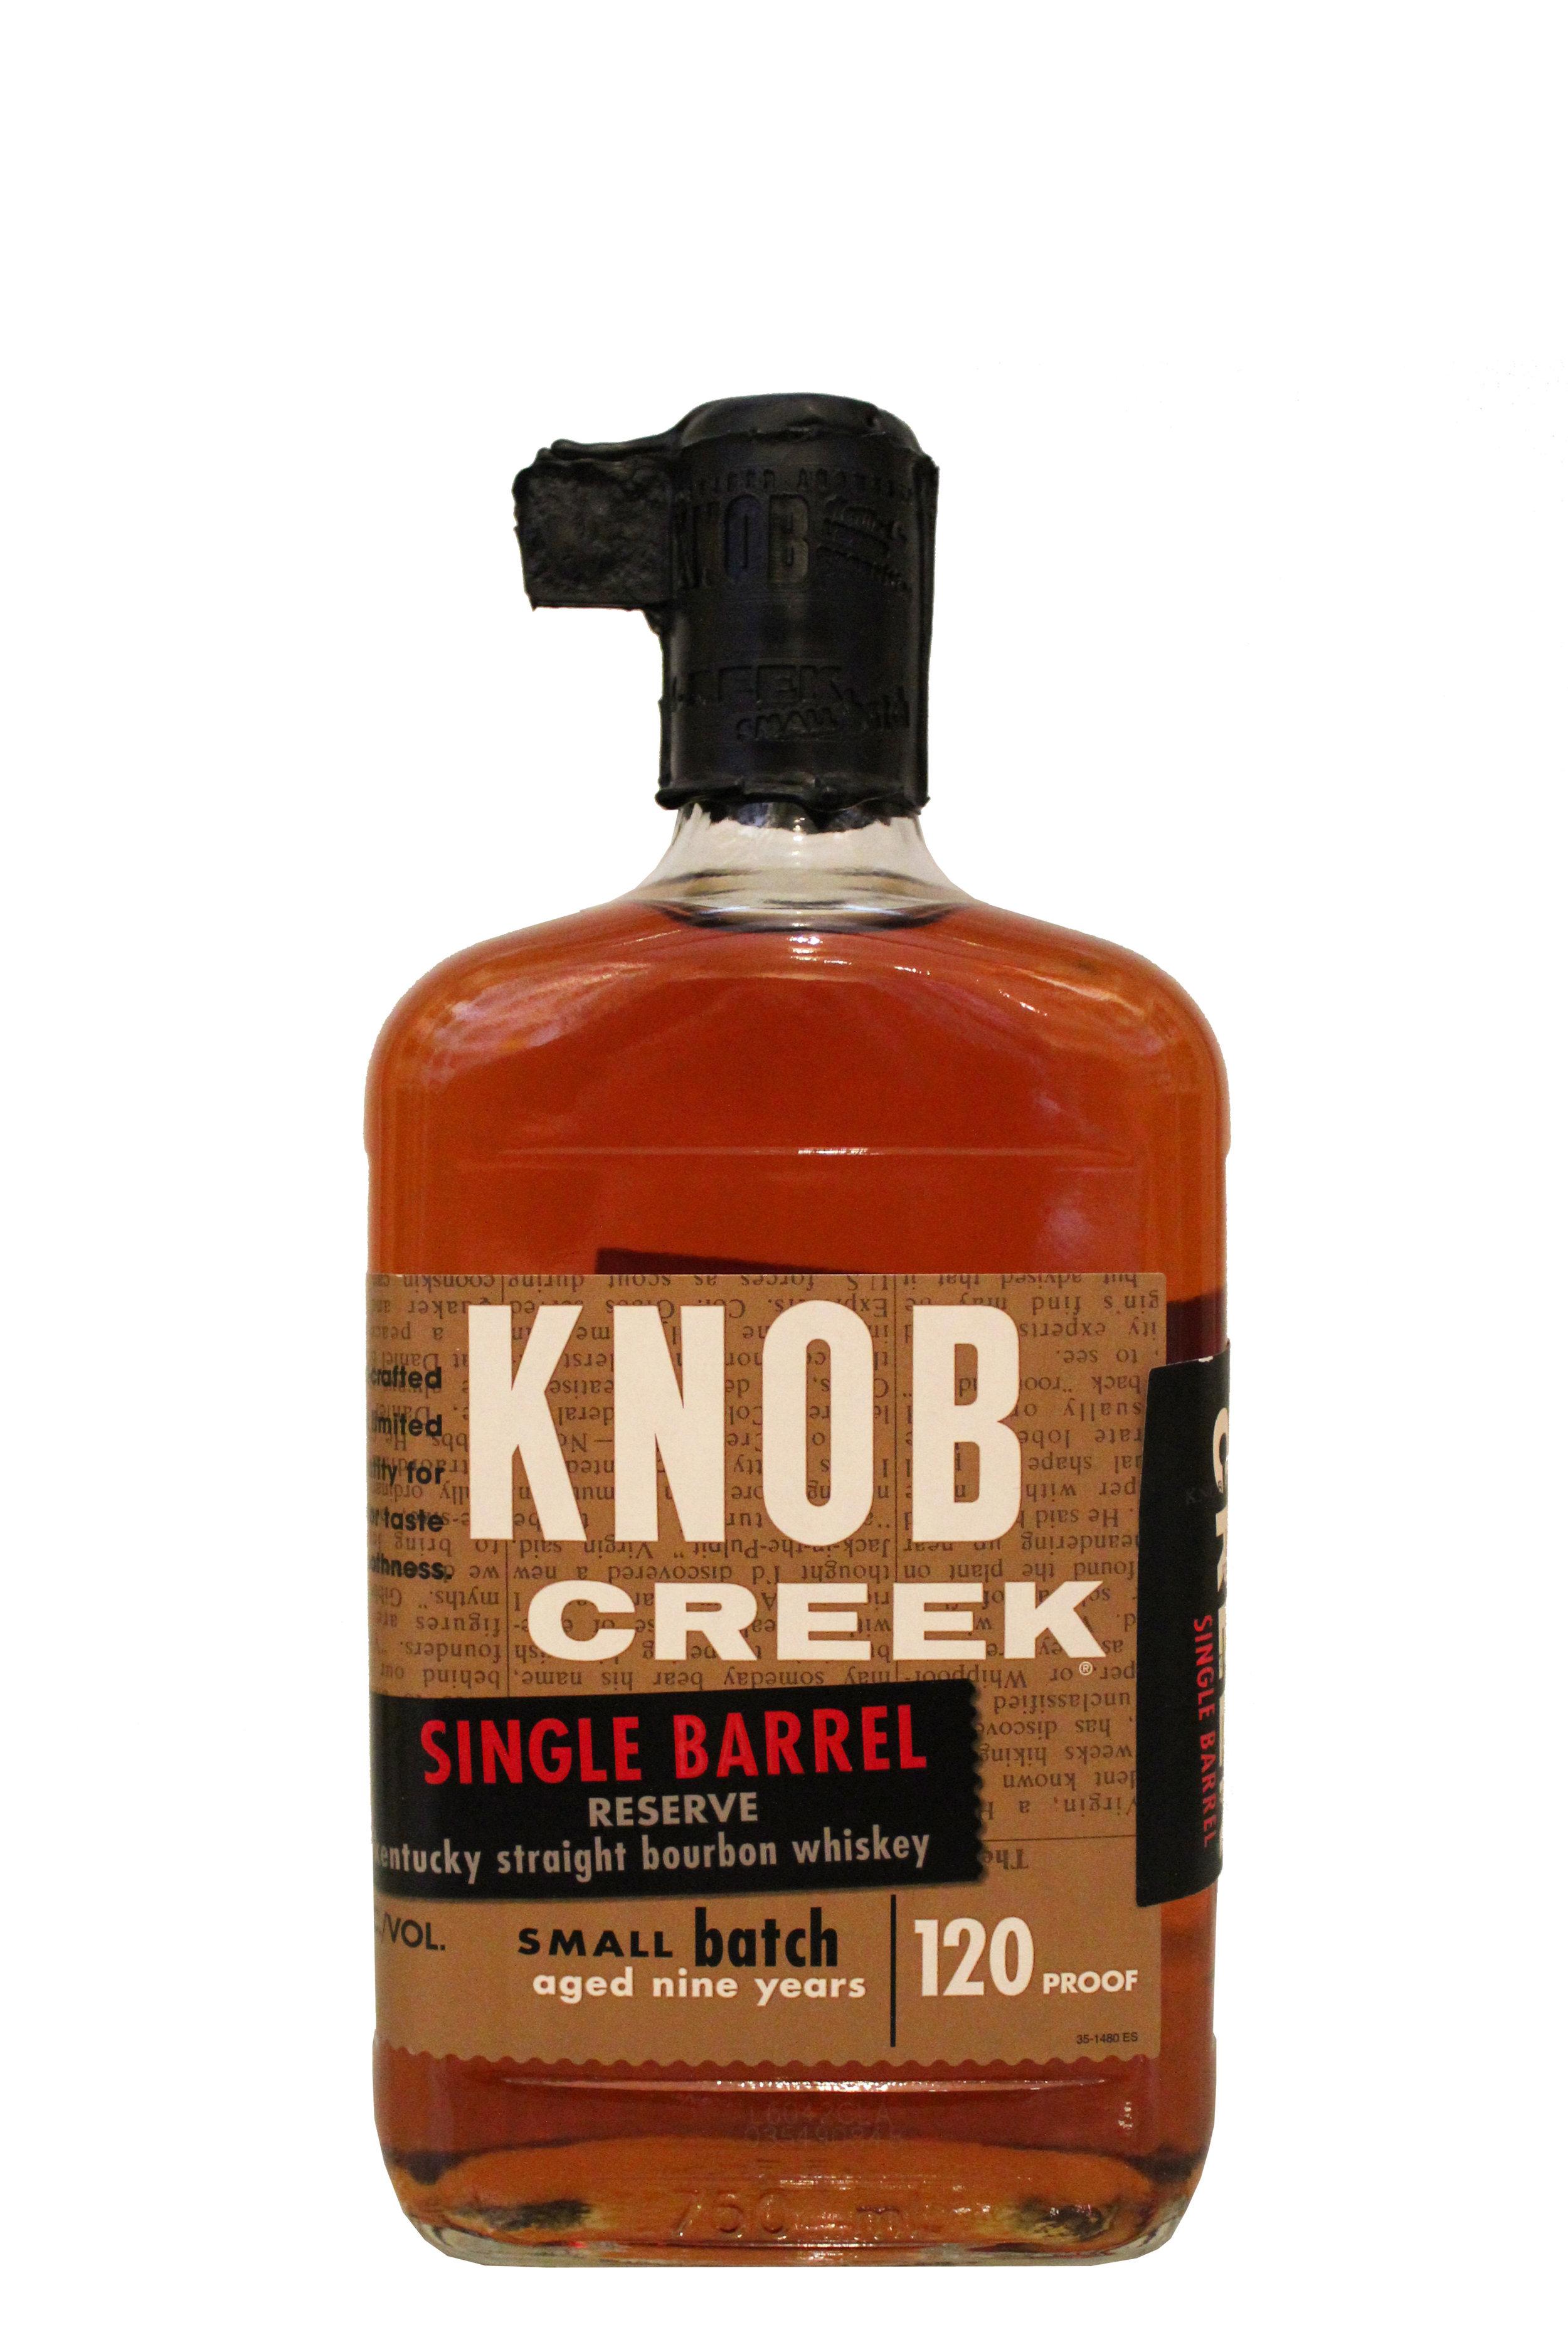 Single Barrel Reserve  Knob Creek, Kentucky